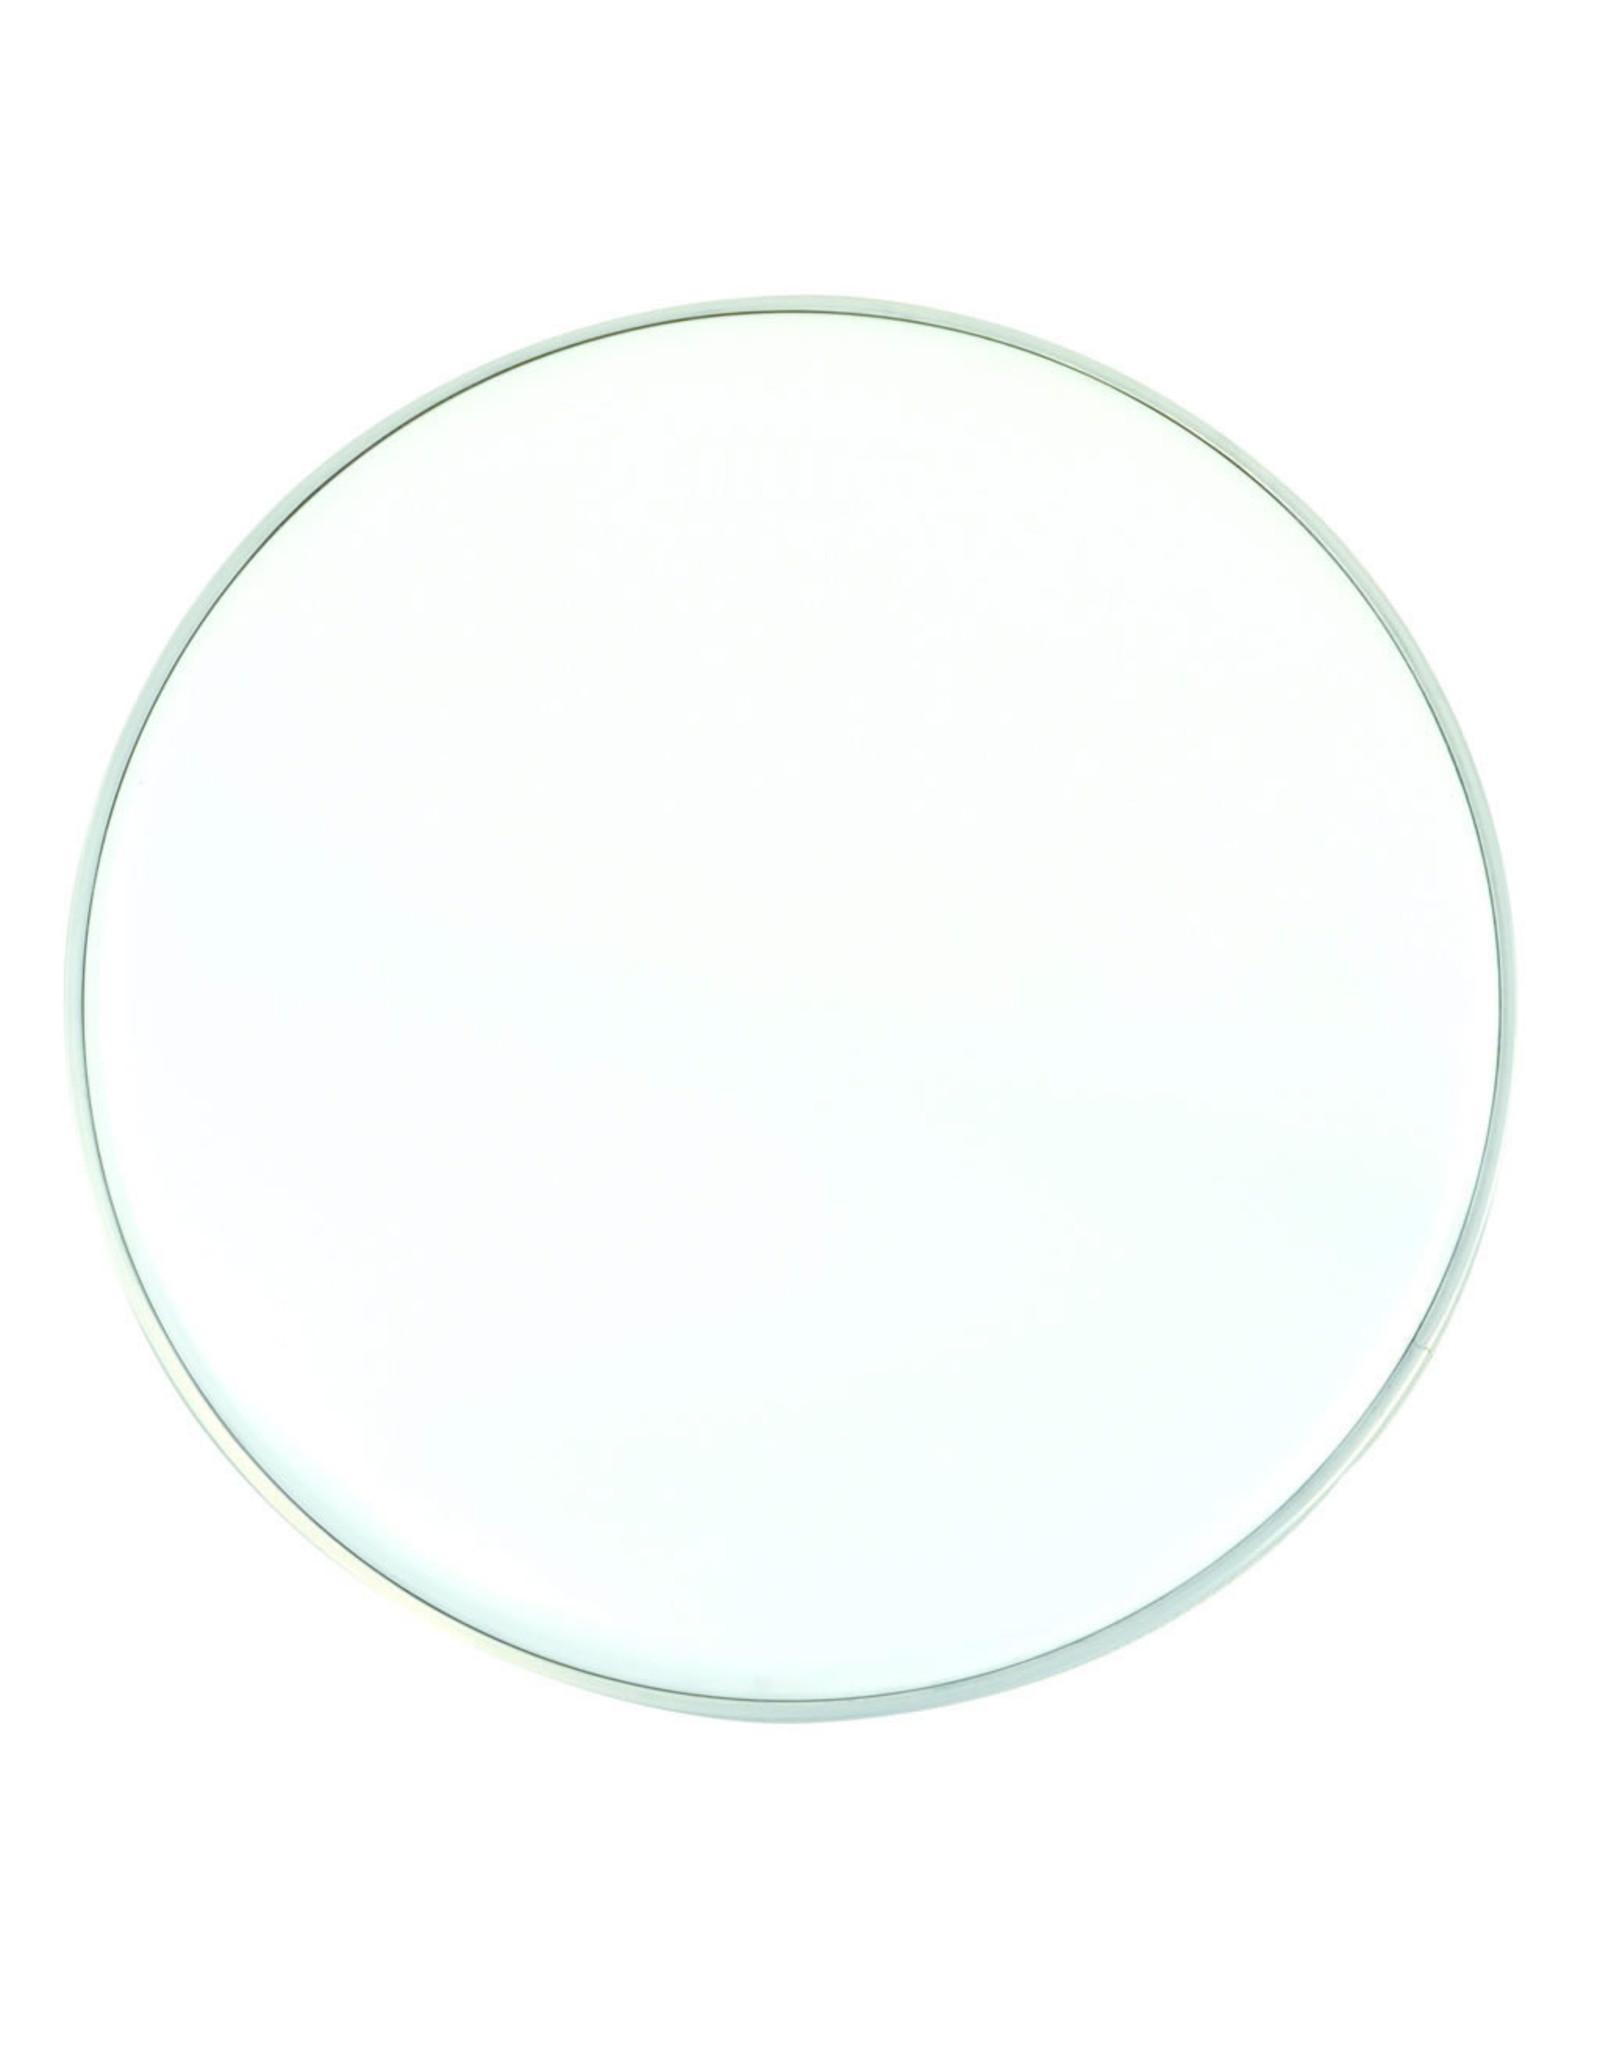 Ramm® Drumhead 13 Inch | Transparent | Resonance